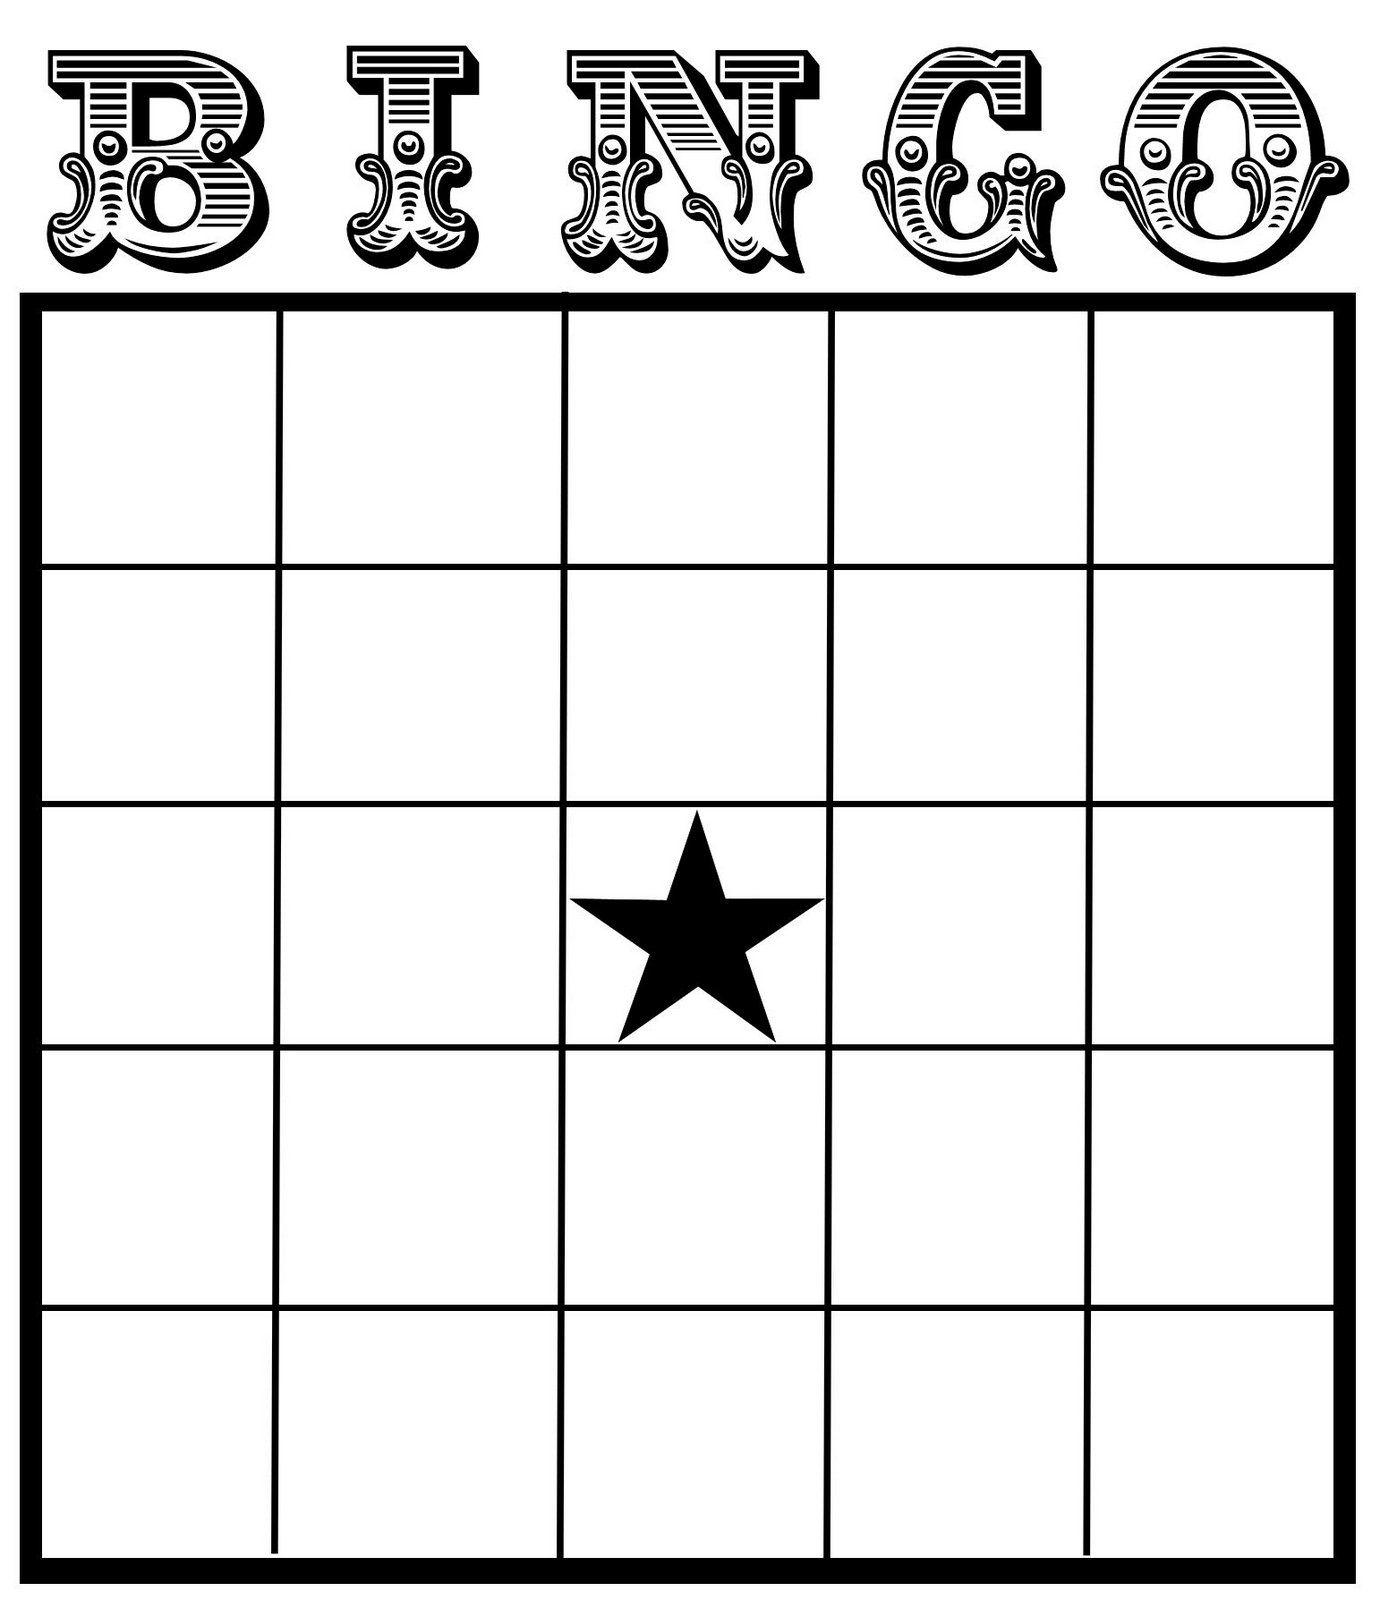 Pin By Brooke Loebs On Minecraft Party Blank Bingo Cards